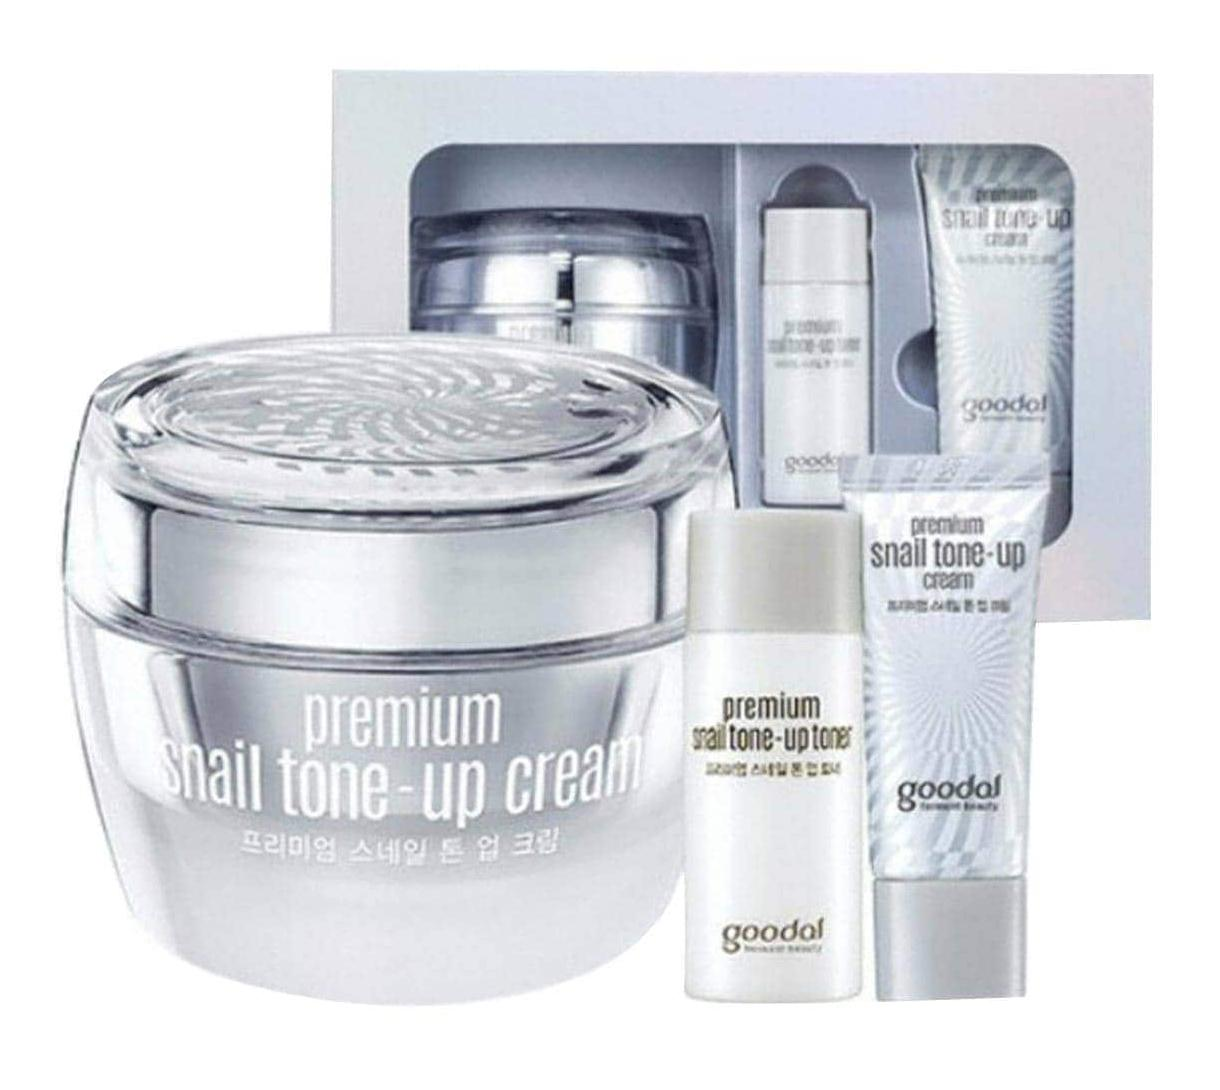 Set Dưỡng Trắng Da Ốc Sên Goodal Premium Snail Tone Up Cream Special Set